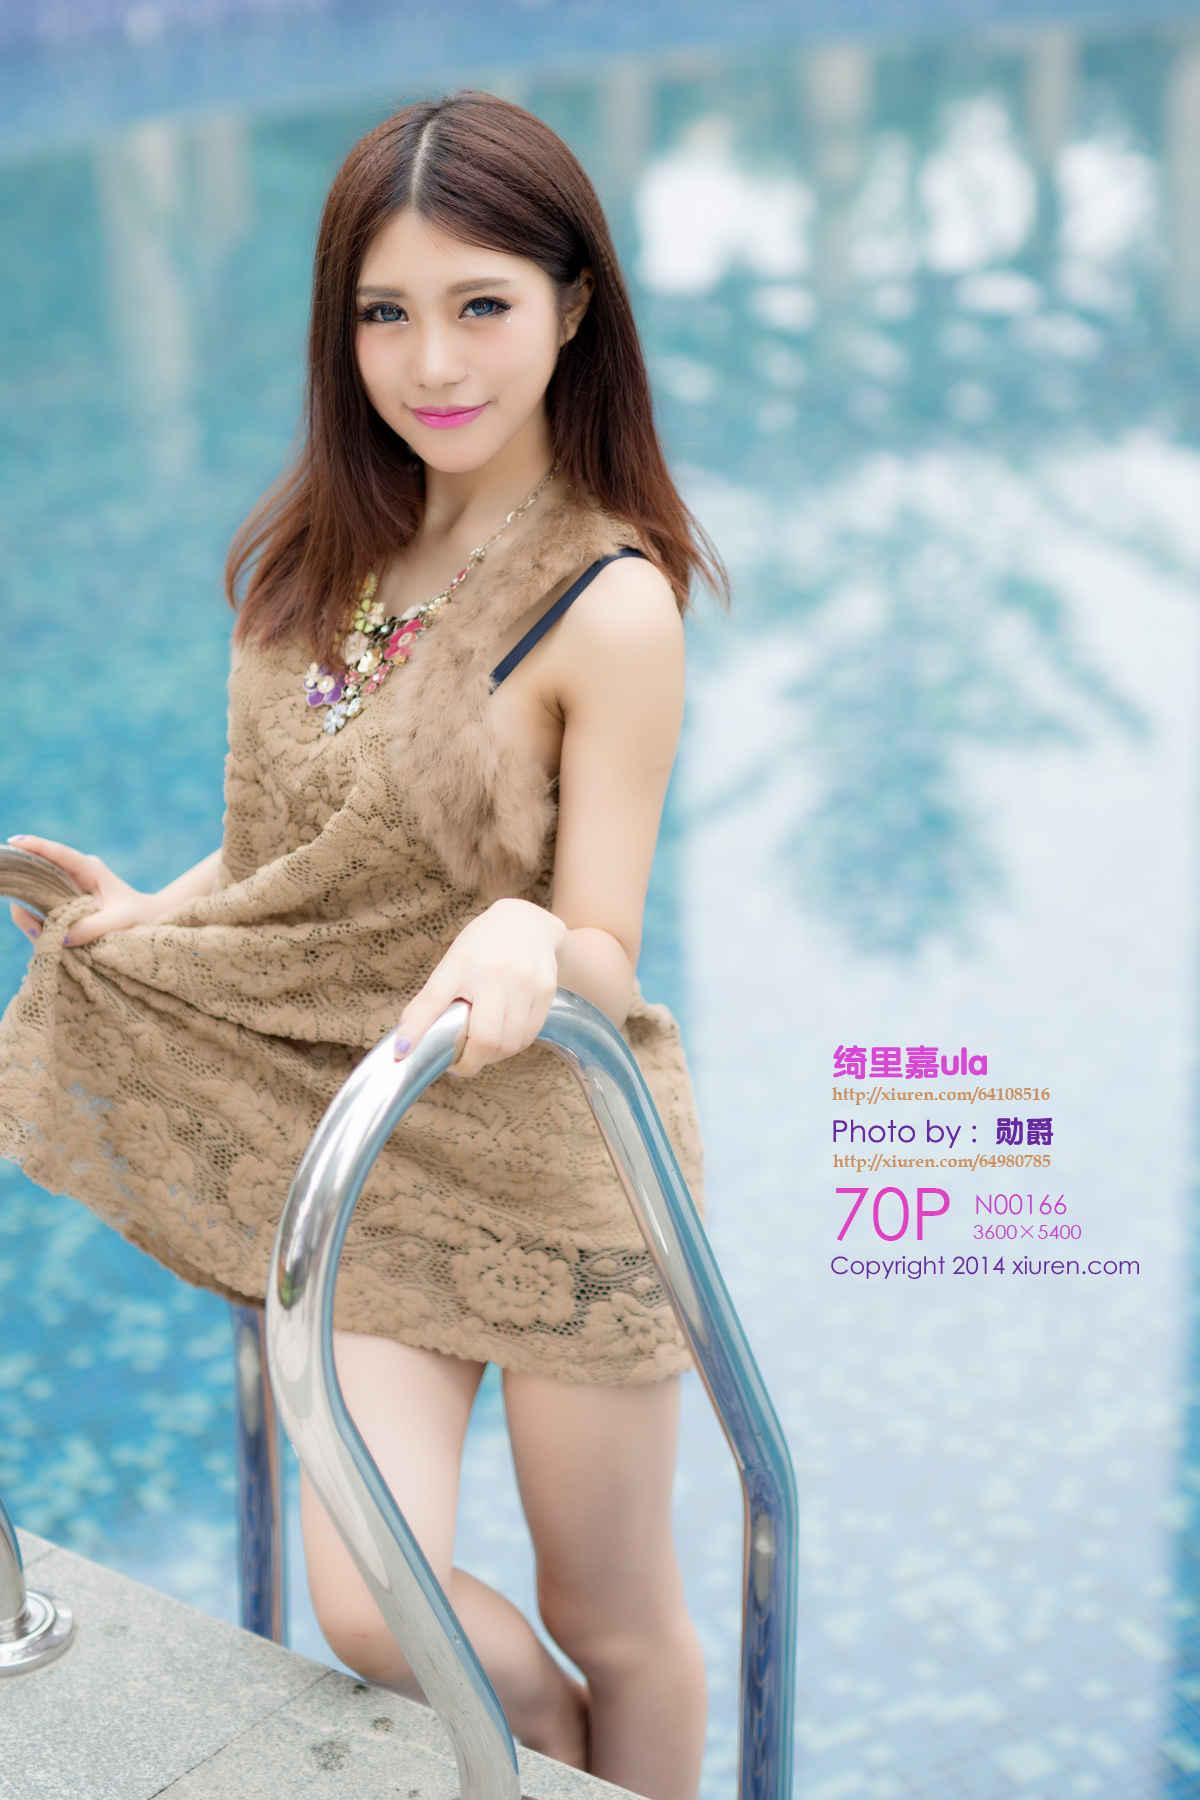 XiuRen-N00166-ula-cover.jpg